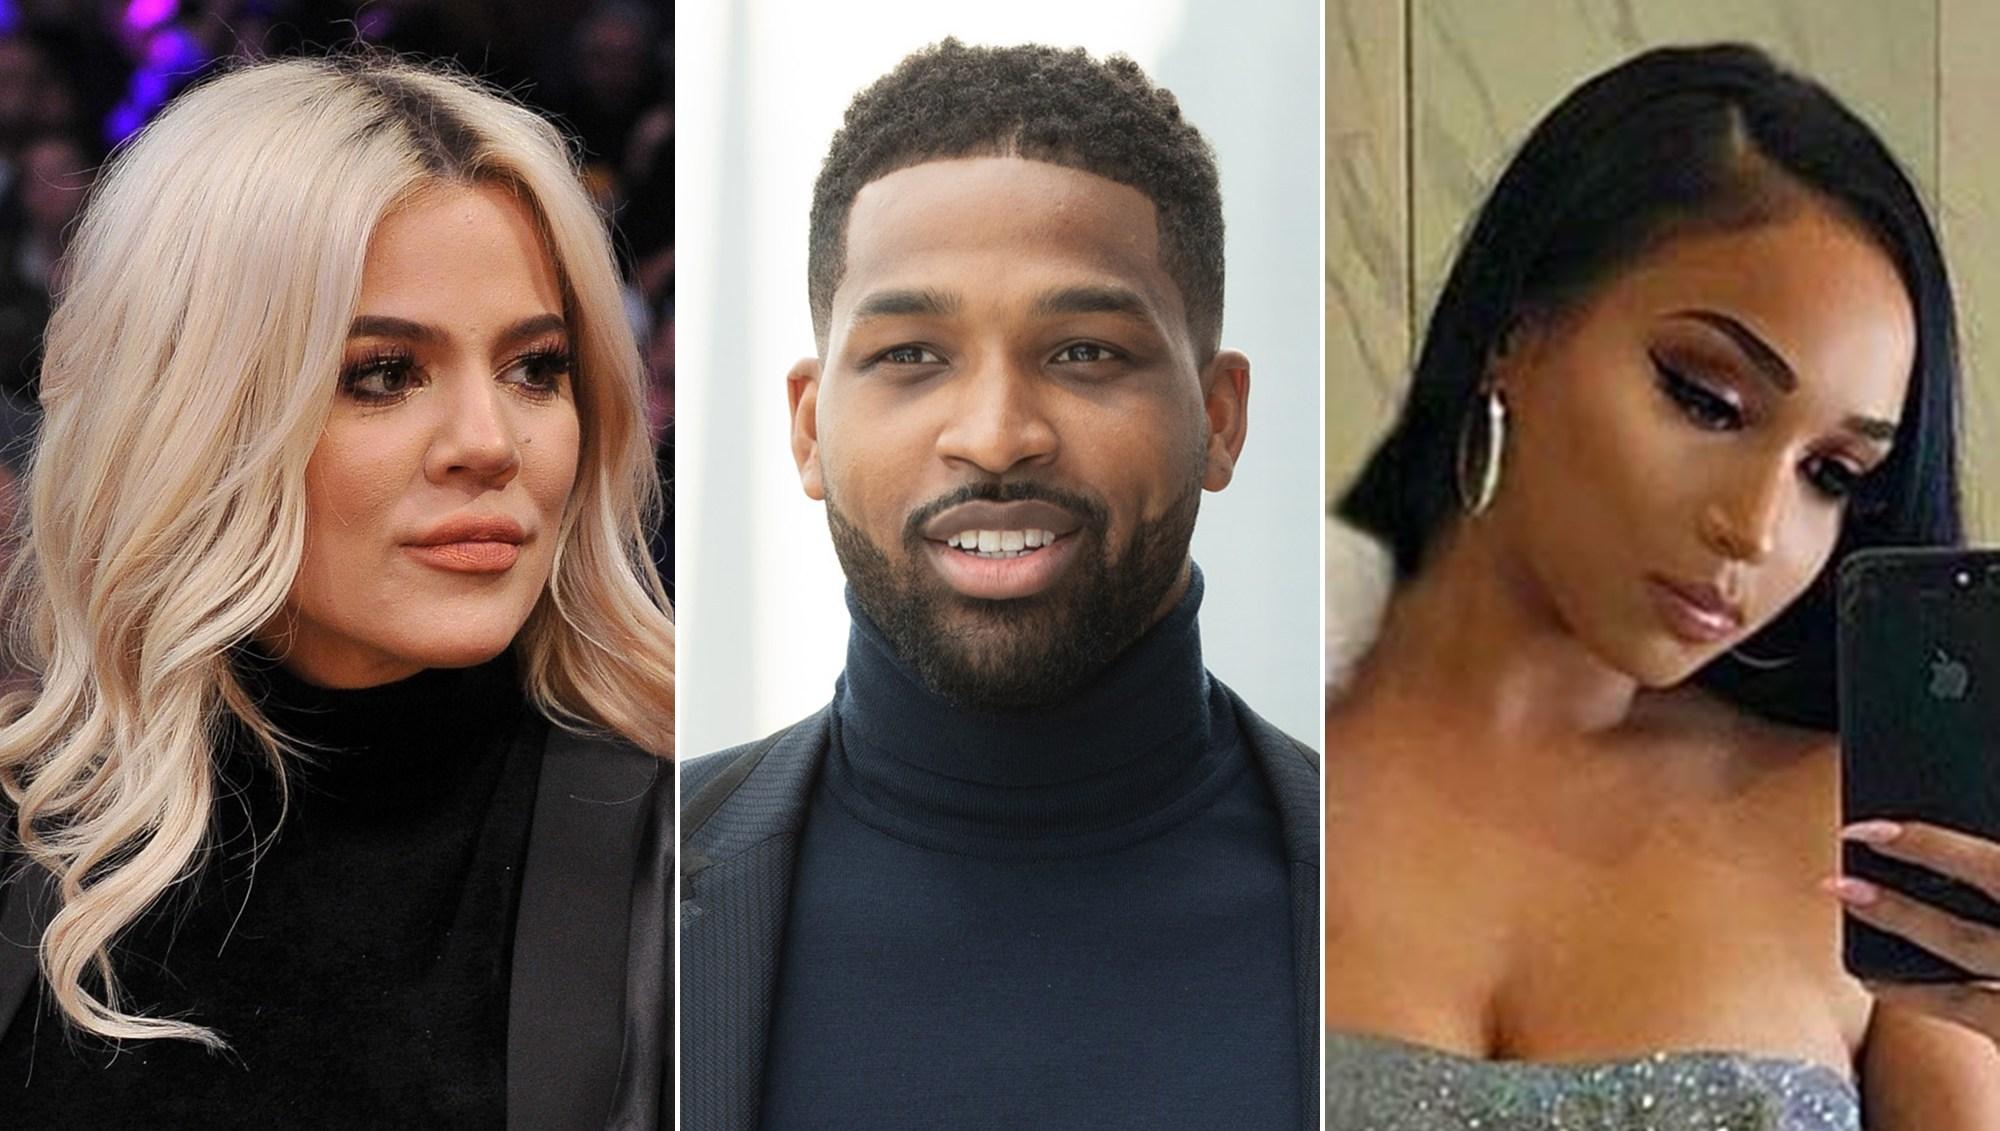 Tristan Thompson 'Crashed' at Ex Jordan Craig's House After Khloé Kardashian 'Kicked Him Out Several Times'